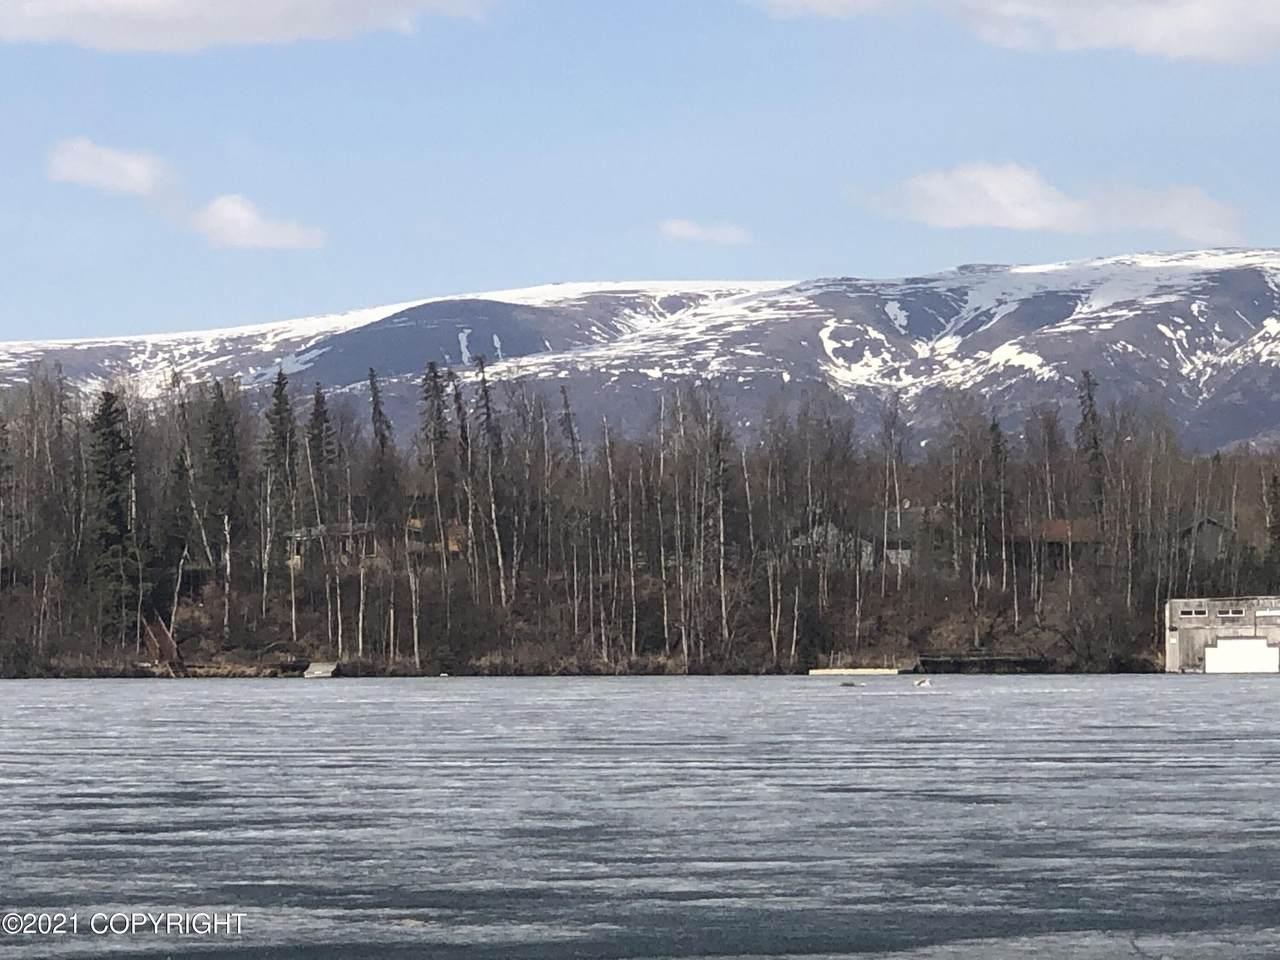 https://bt-photos.global.ssl.fastly.net/alaska/1280_boomver_1_21-6678-2.jpg